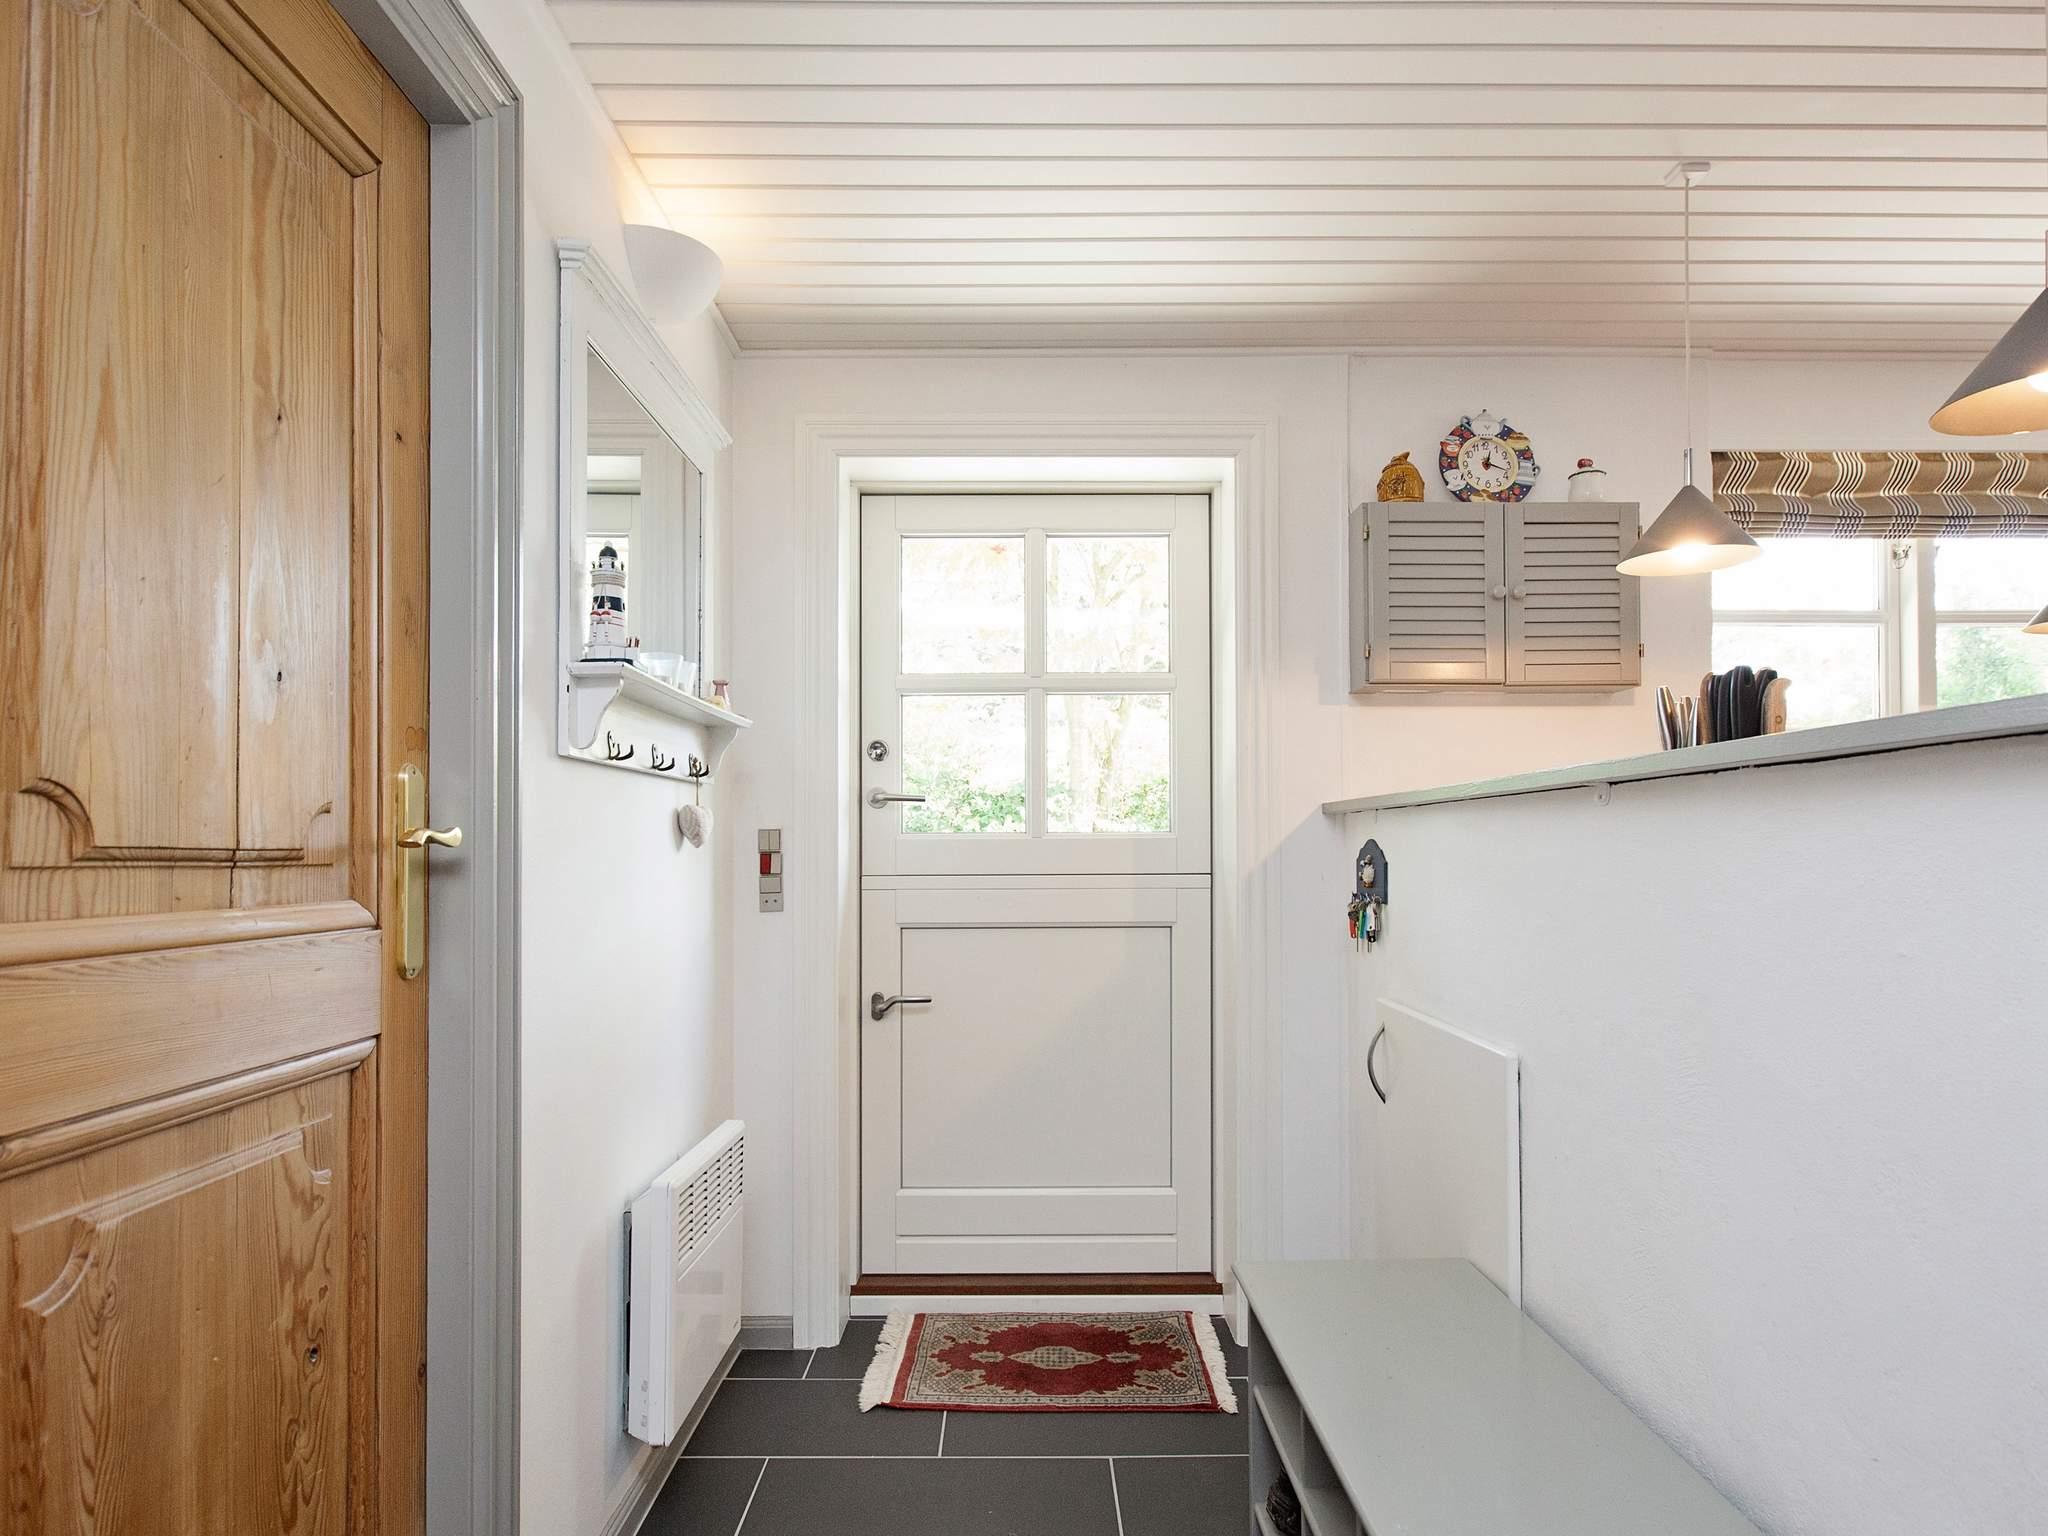 Ferienhaus Vejby Strand (319895), Vejby, , Nordseeland, Dänemark, Bild 12